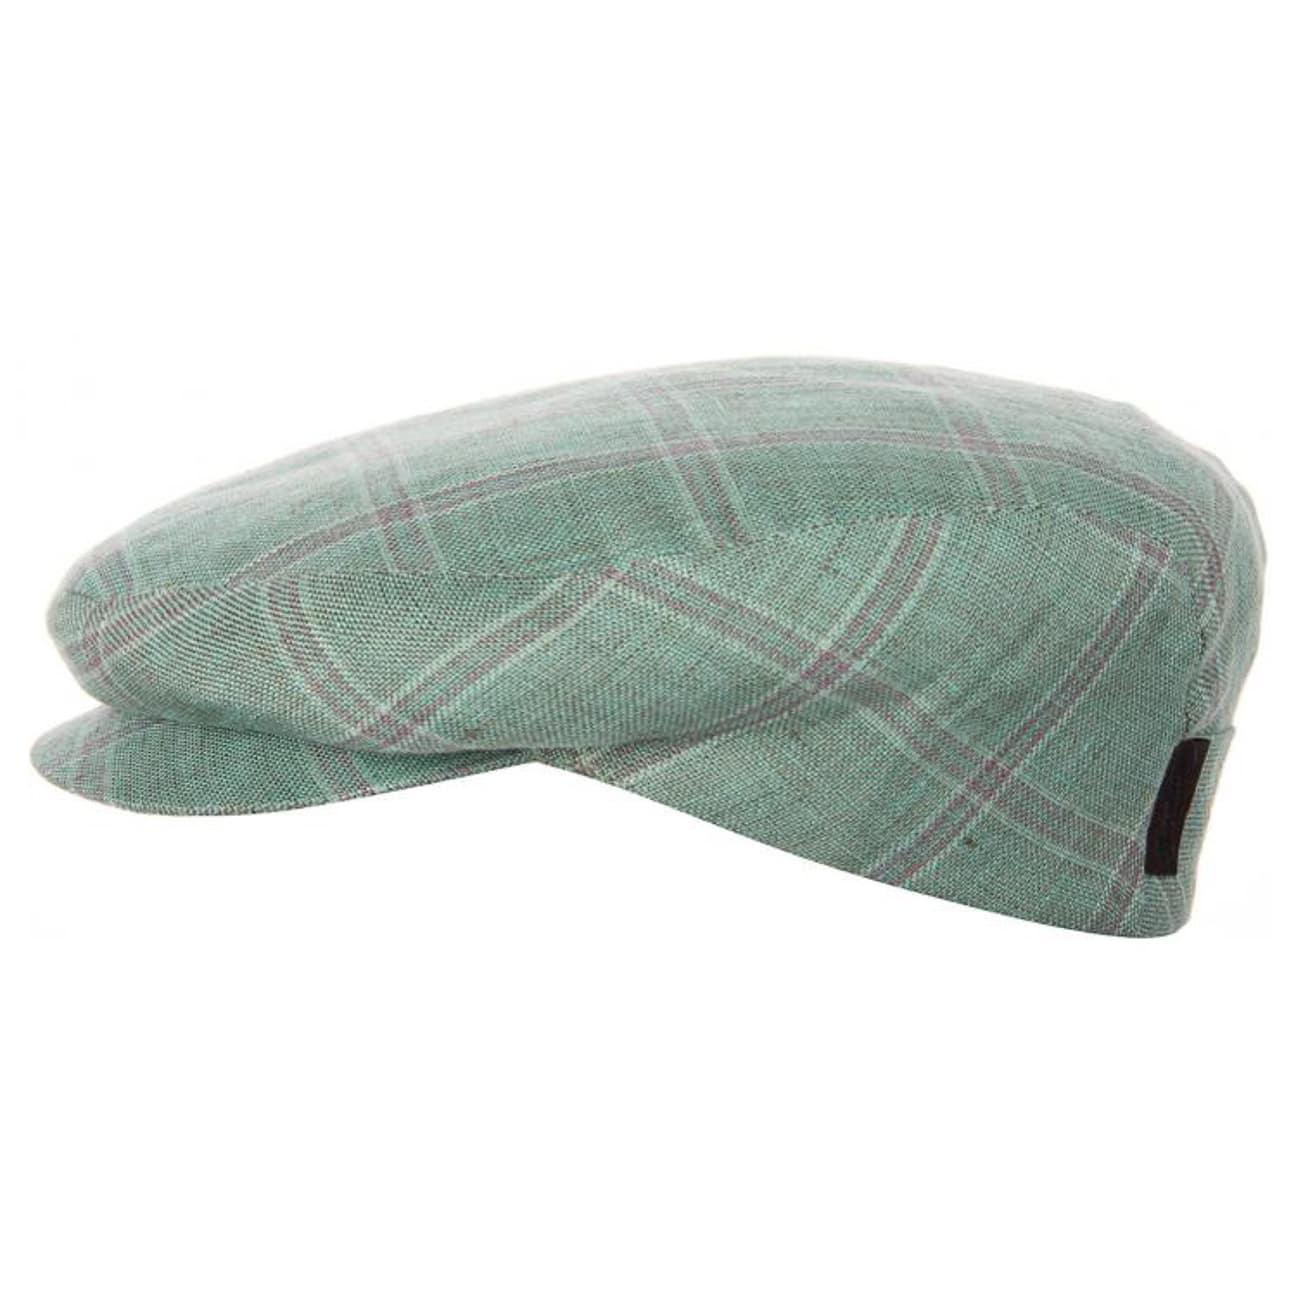 ccf496c68b7 ... Dante Linen Cap by Borsalino - green 1